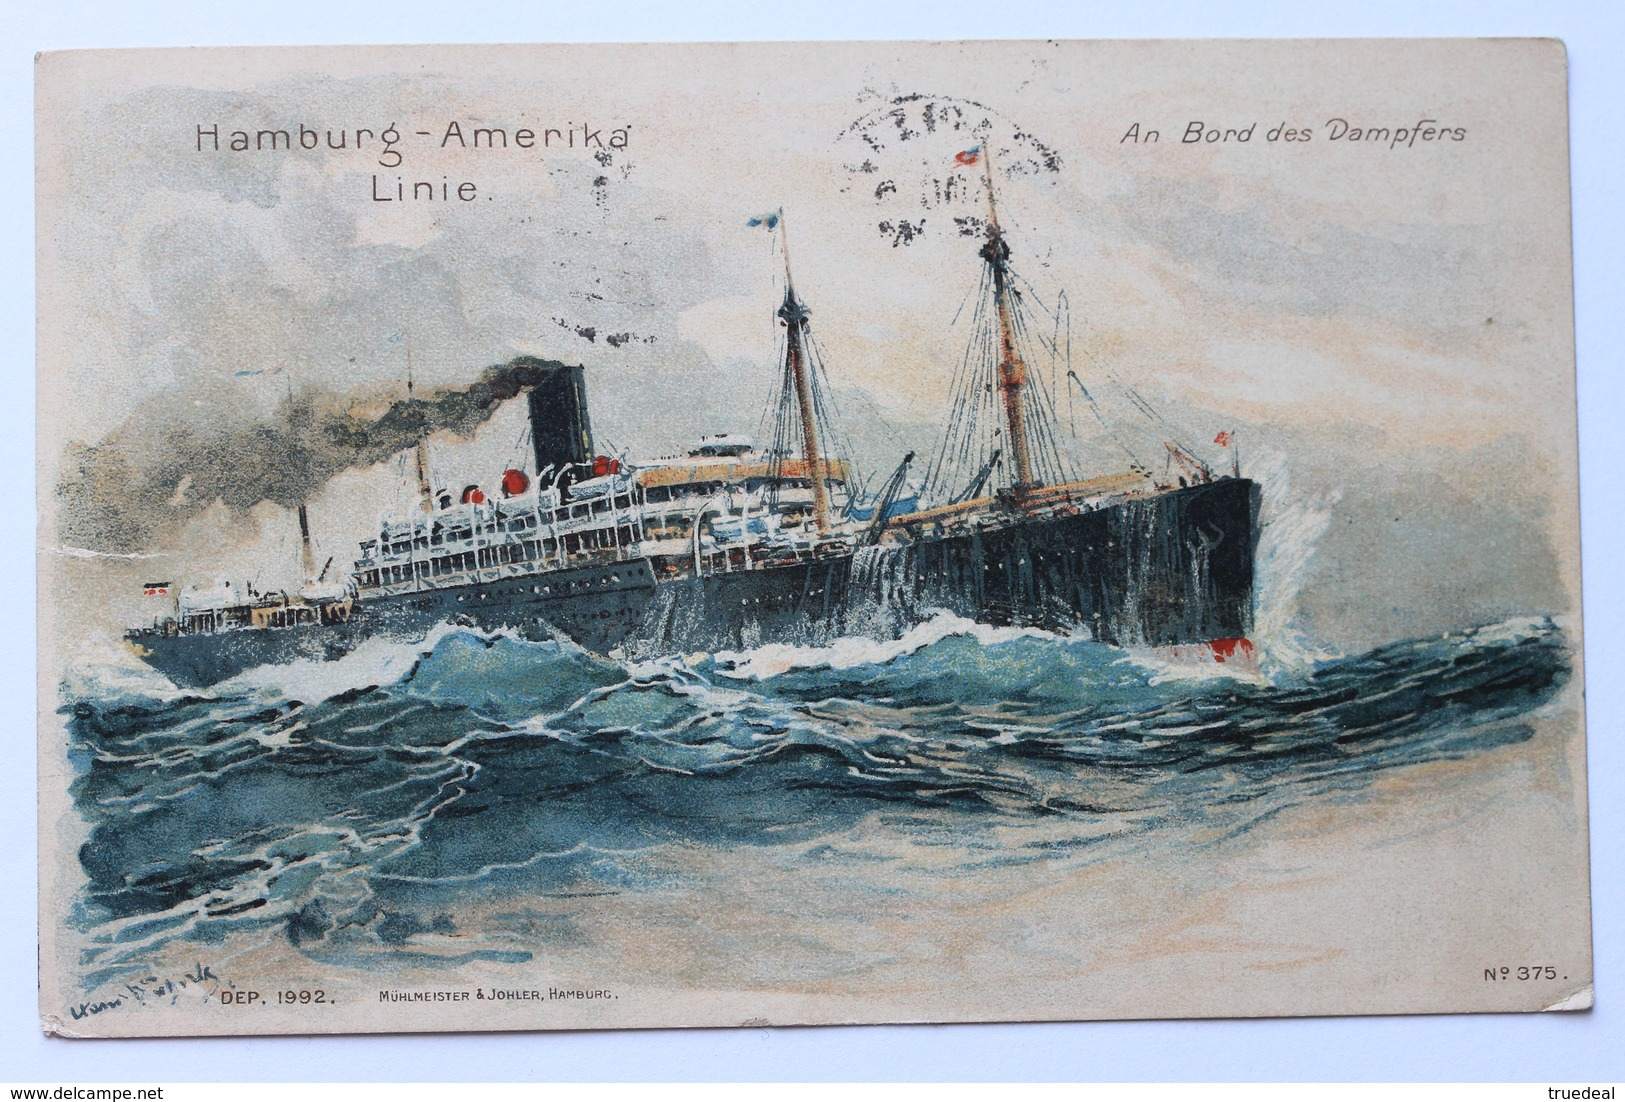 An Bord Des Dampfers Hamburg-Amerika Linie, Early 1900-10s, Steamer (damaged) - Steamers